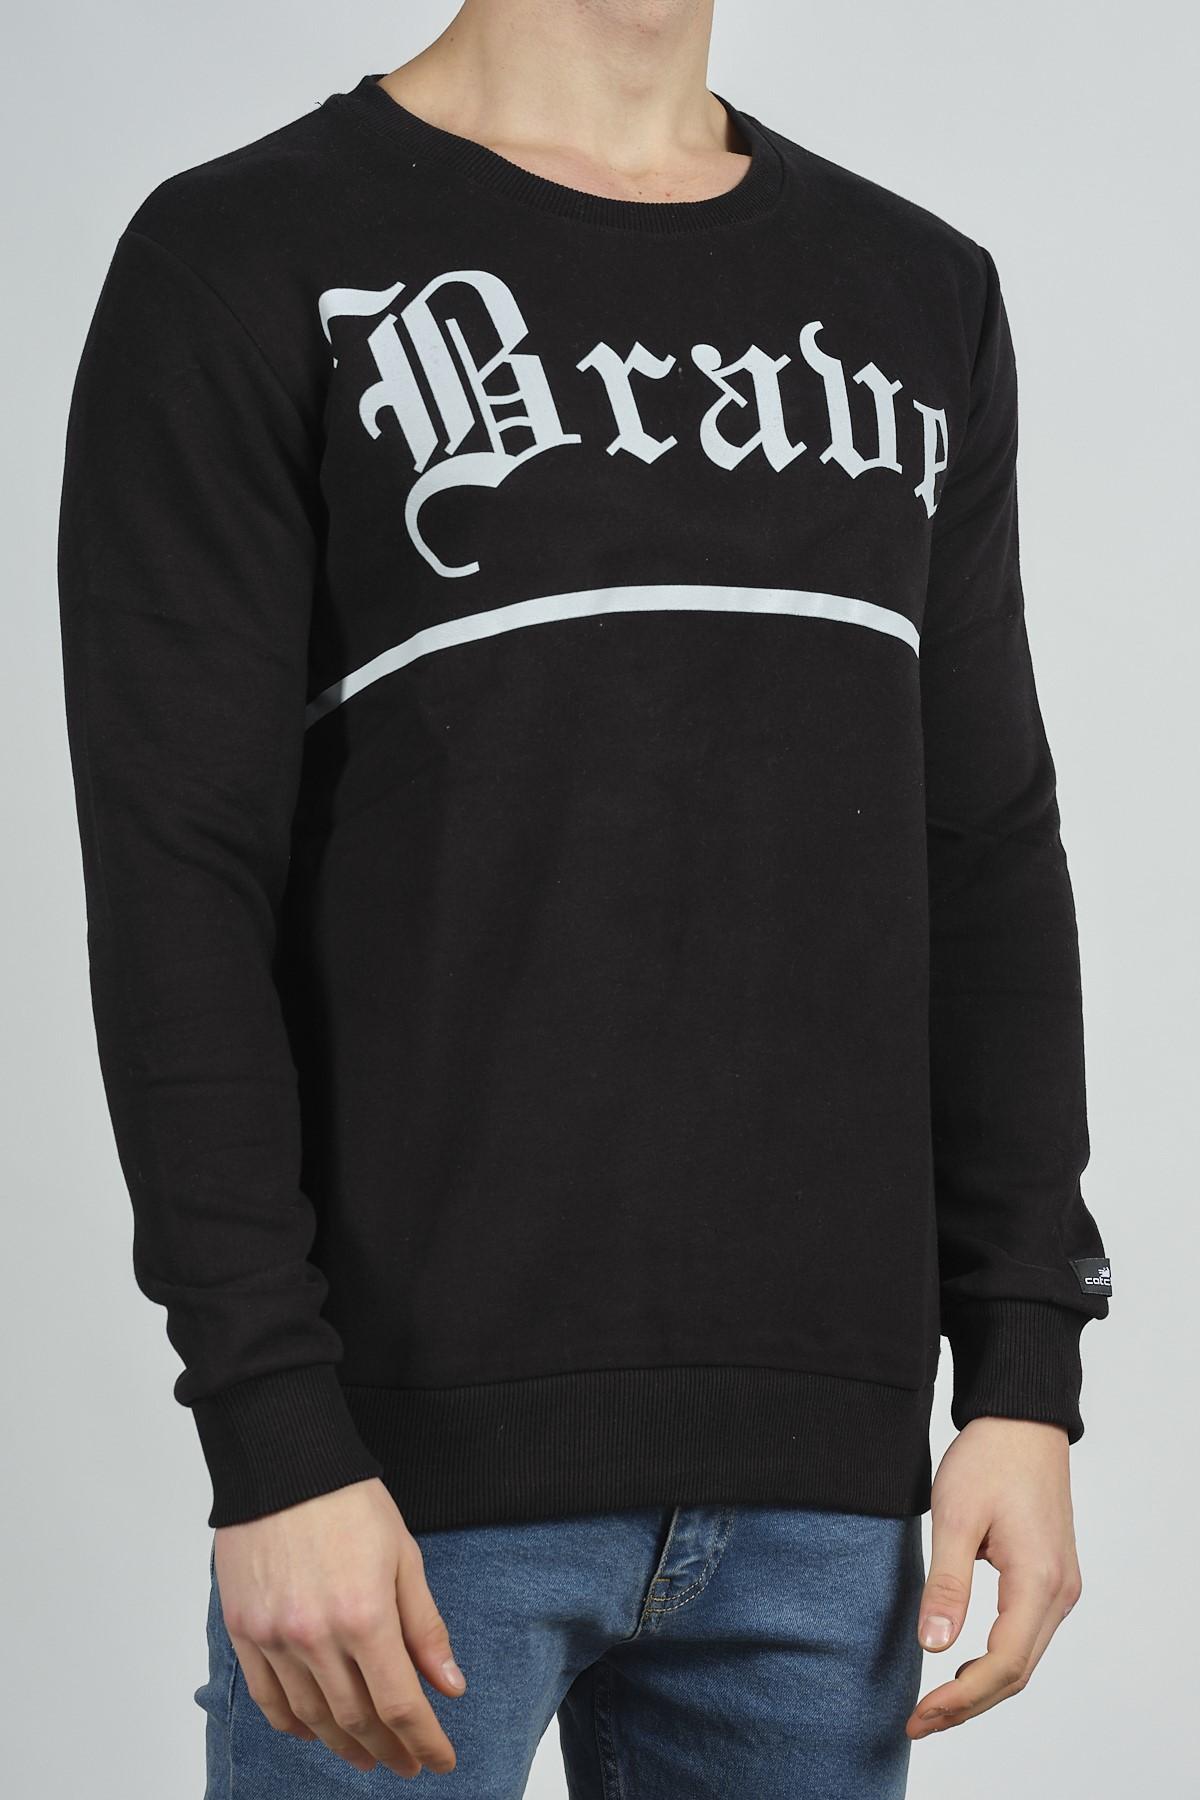 - Siyah Baskılı Sweatshirt 1KXE8-44268-02